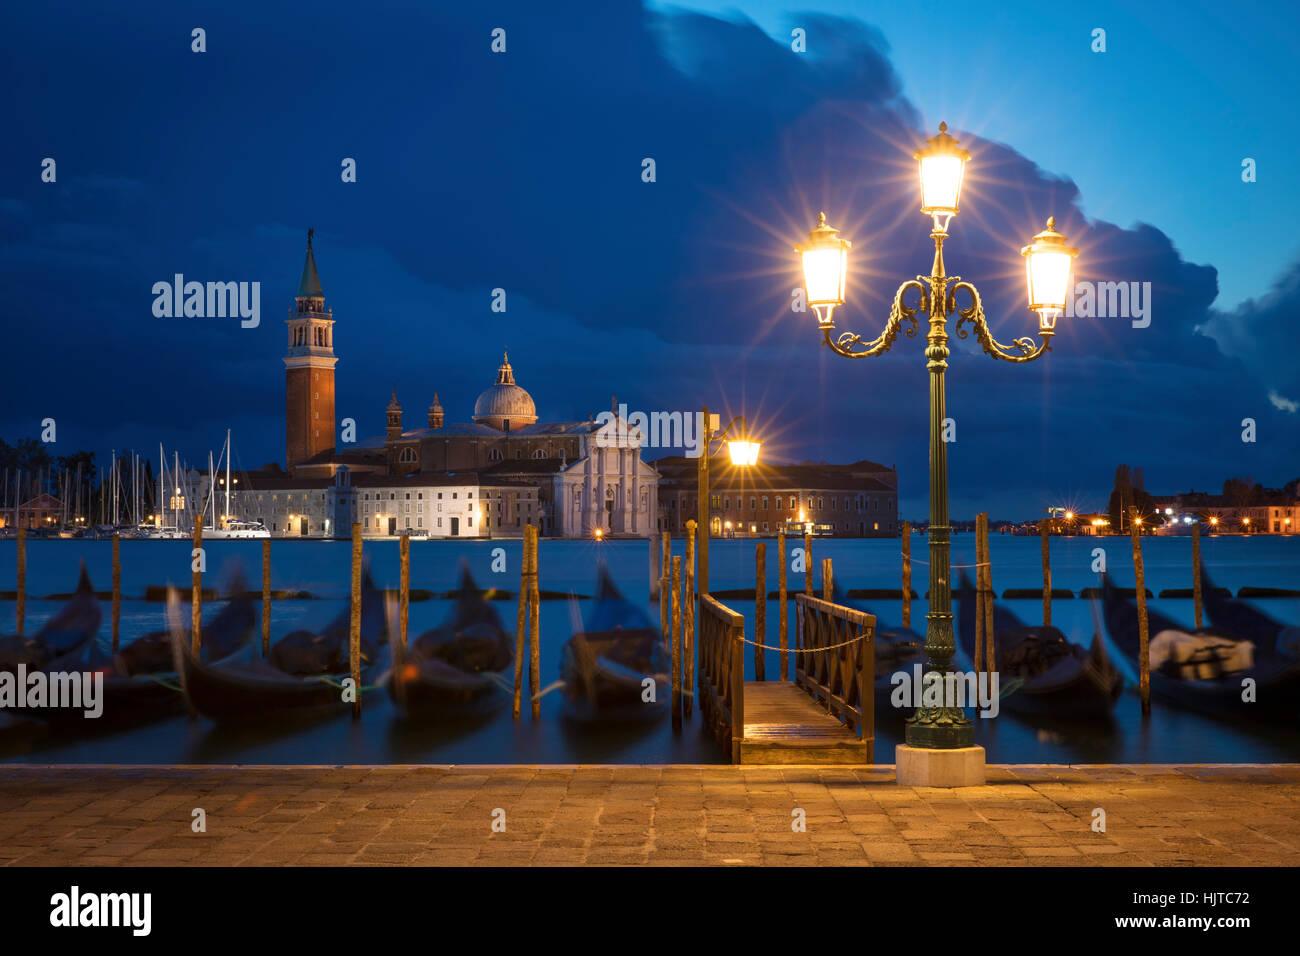 Am frühen Morgen Blick über Gondeln und San Giorgio Maggiore, Venedig, Veneto, Italien Stockfoto